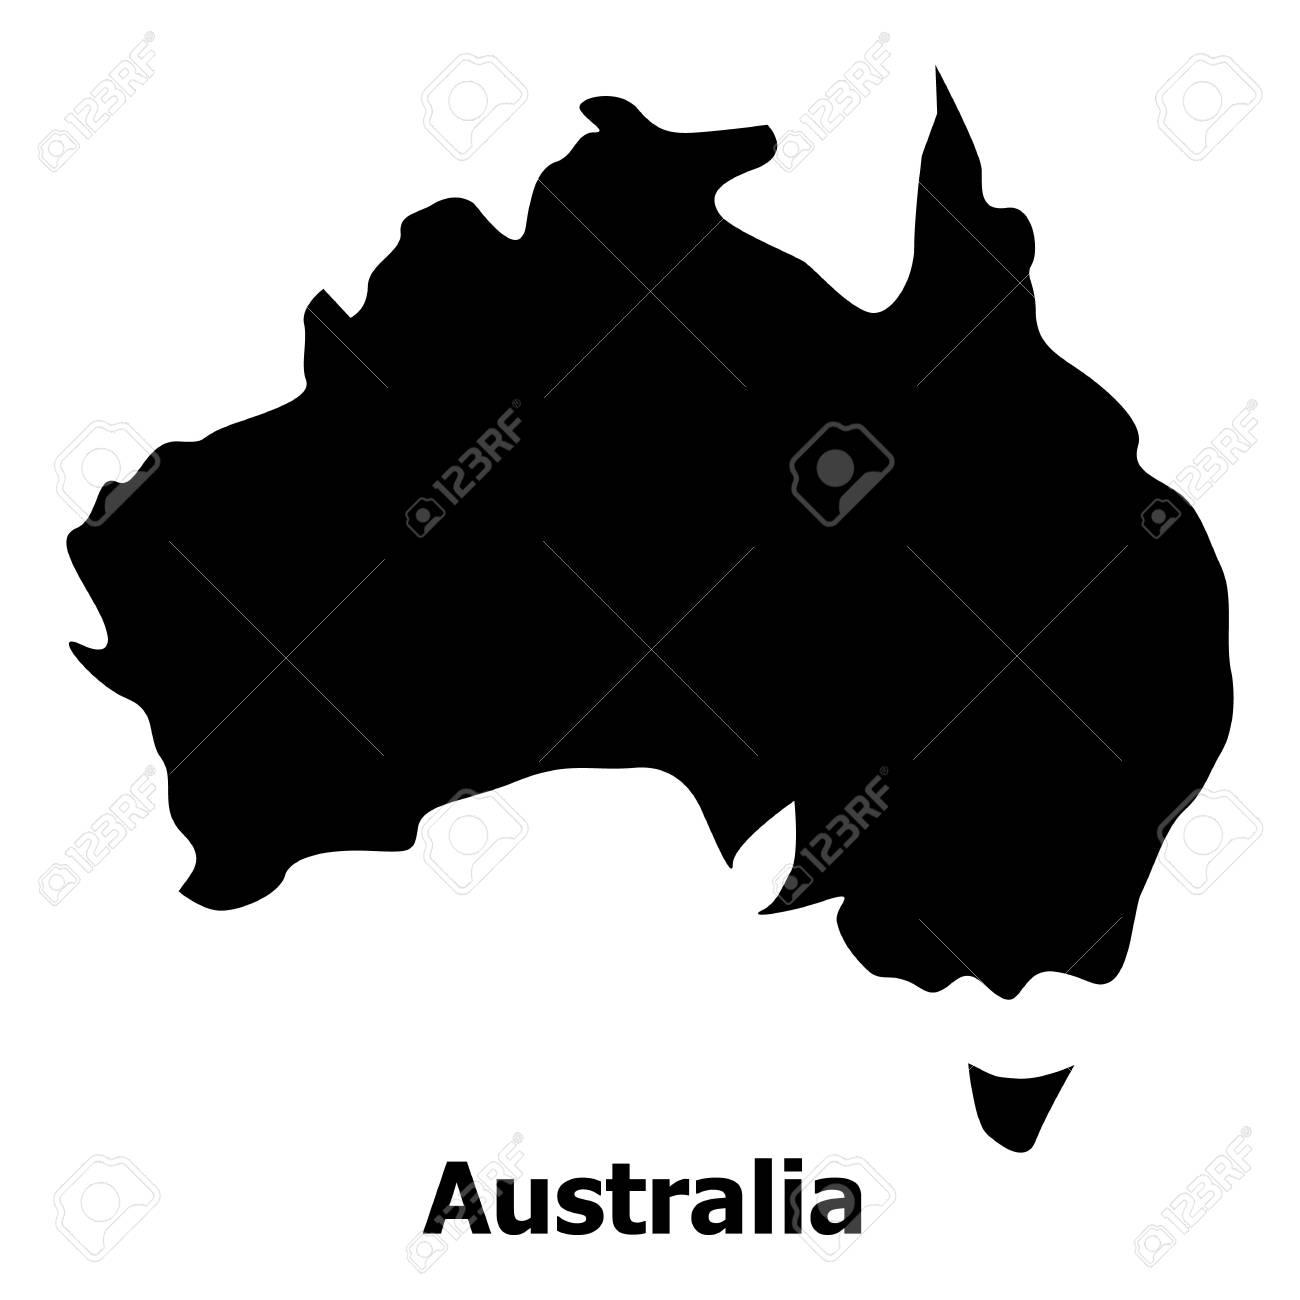 Australia Map Icon.Australia Map Icon Simple Illustration Of Australia Map Vector